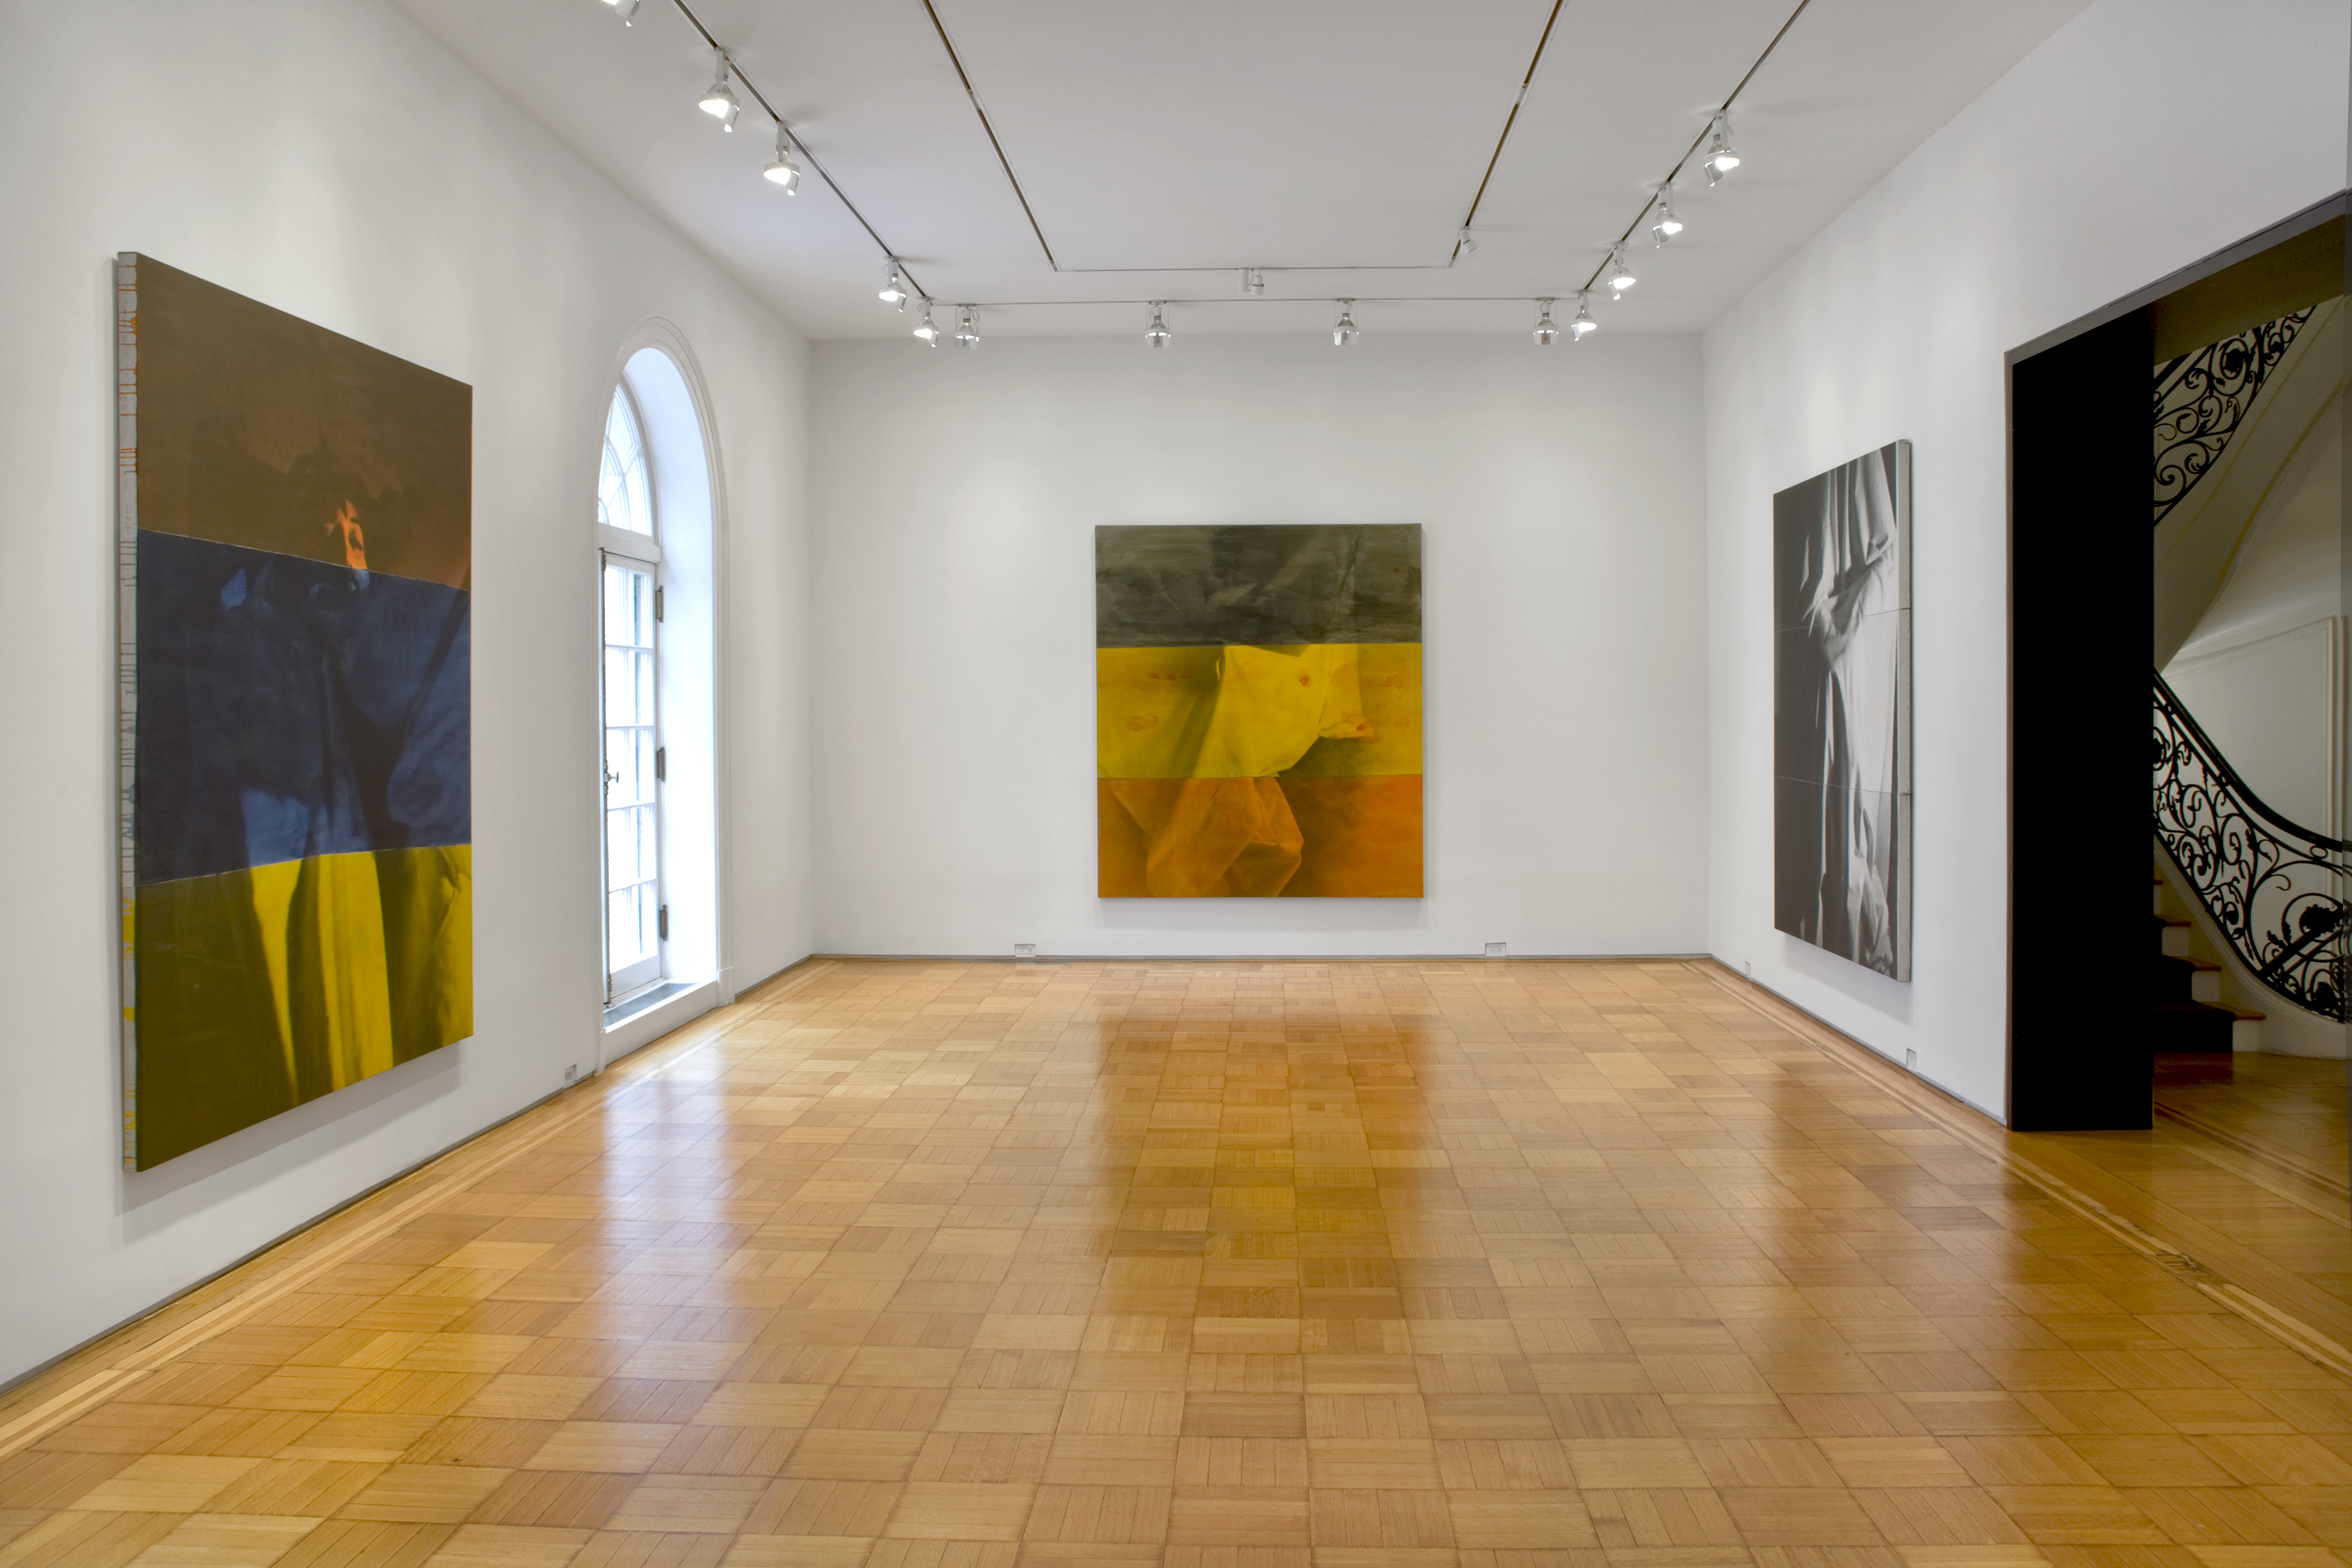 David Salle, Ghost Paintings (Installation view), © David Salle, VAGA,